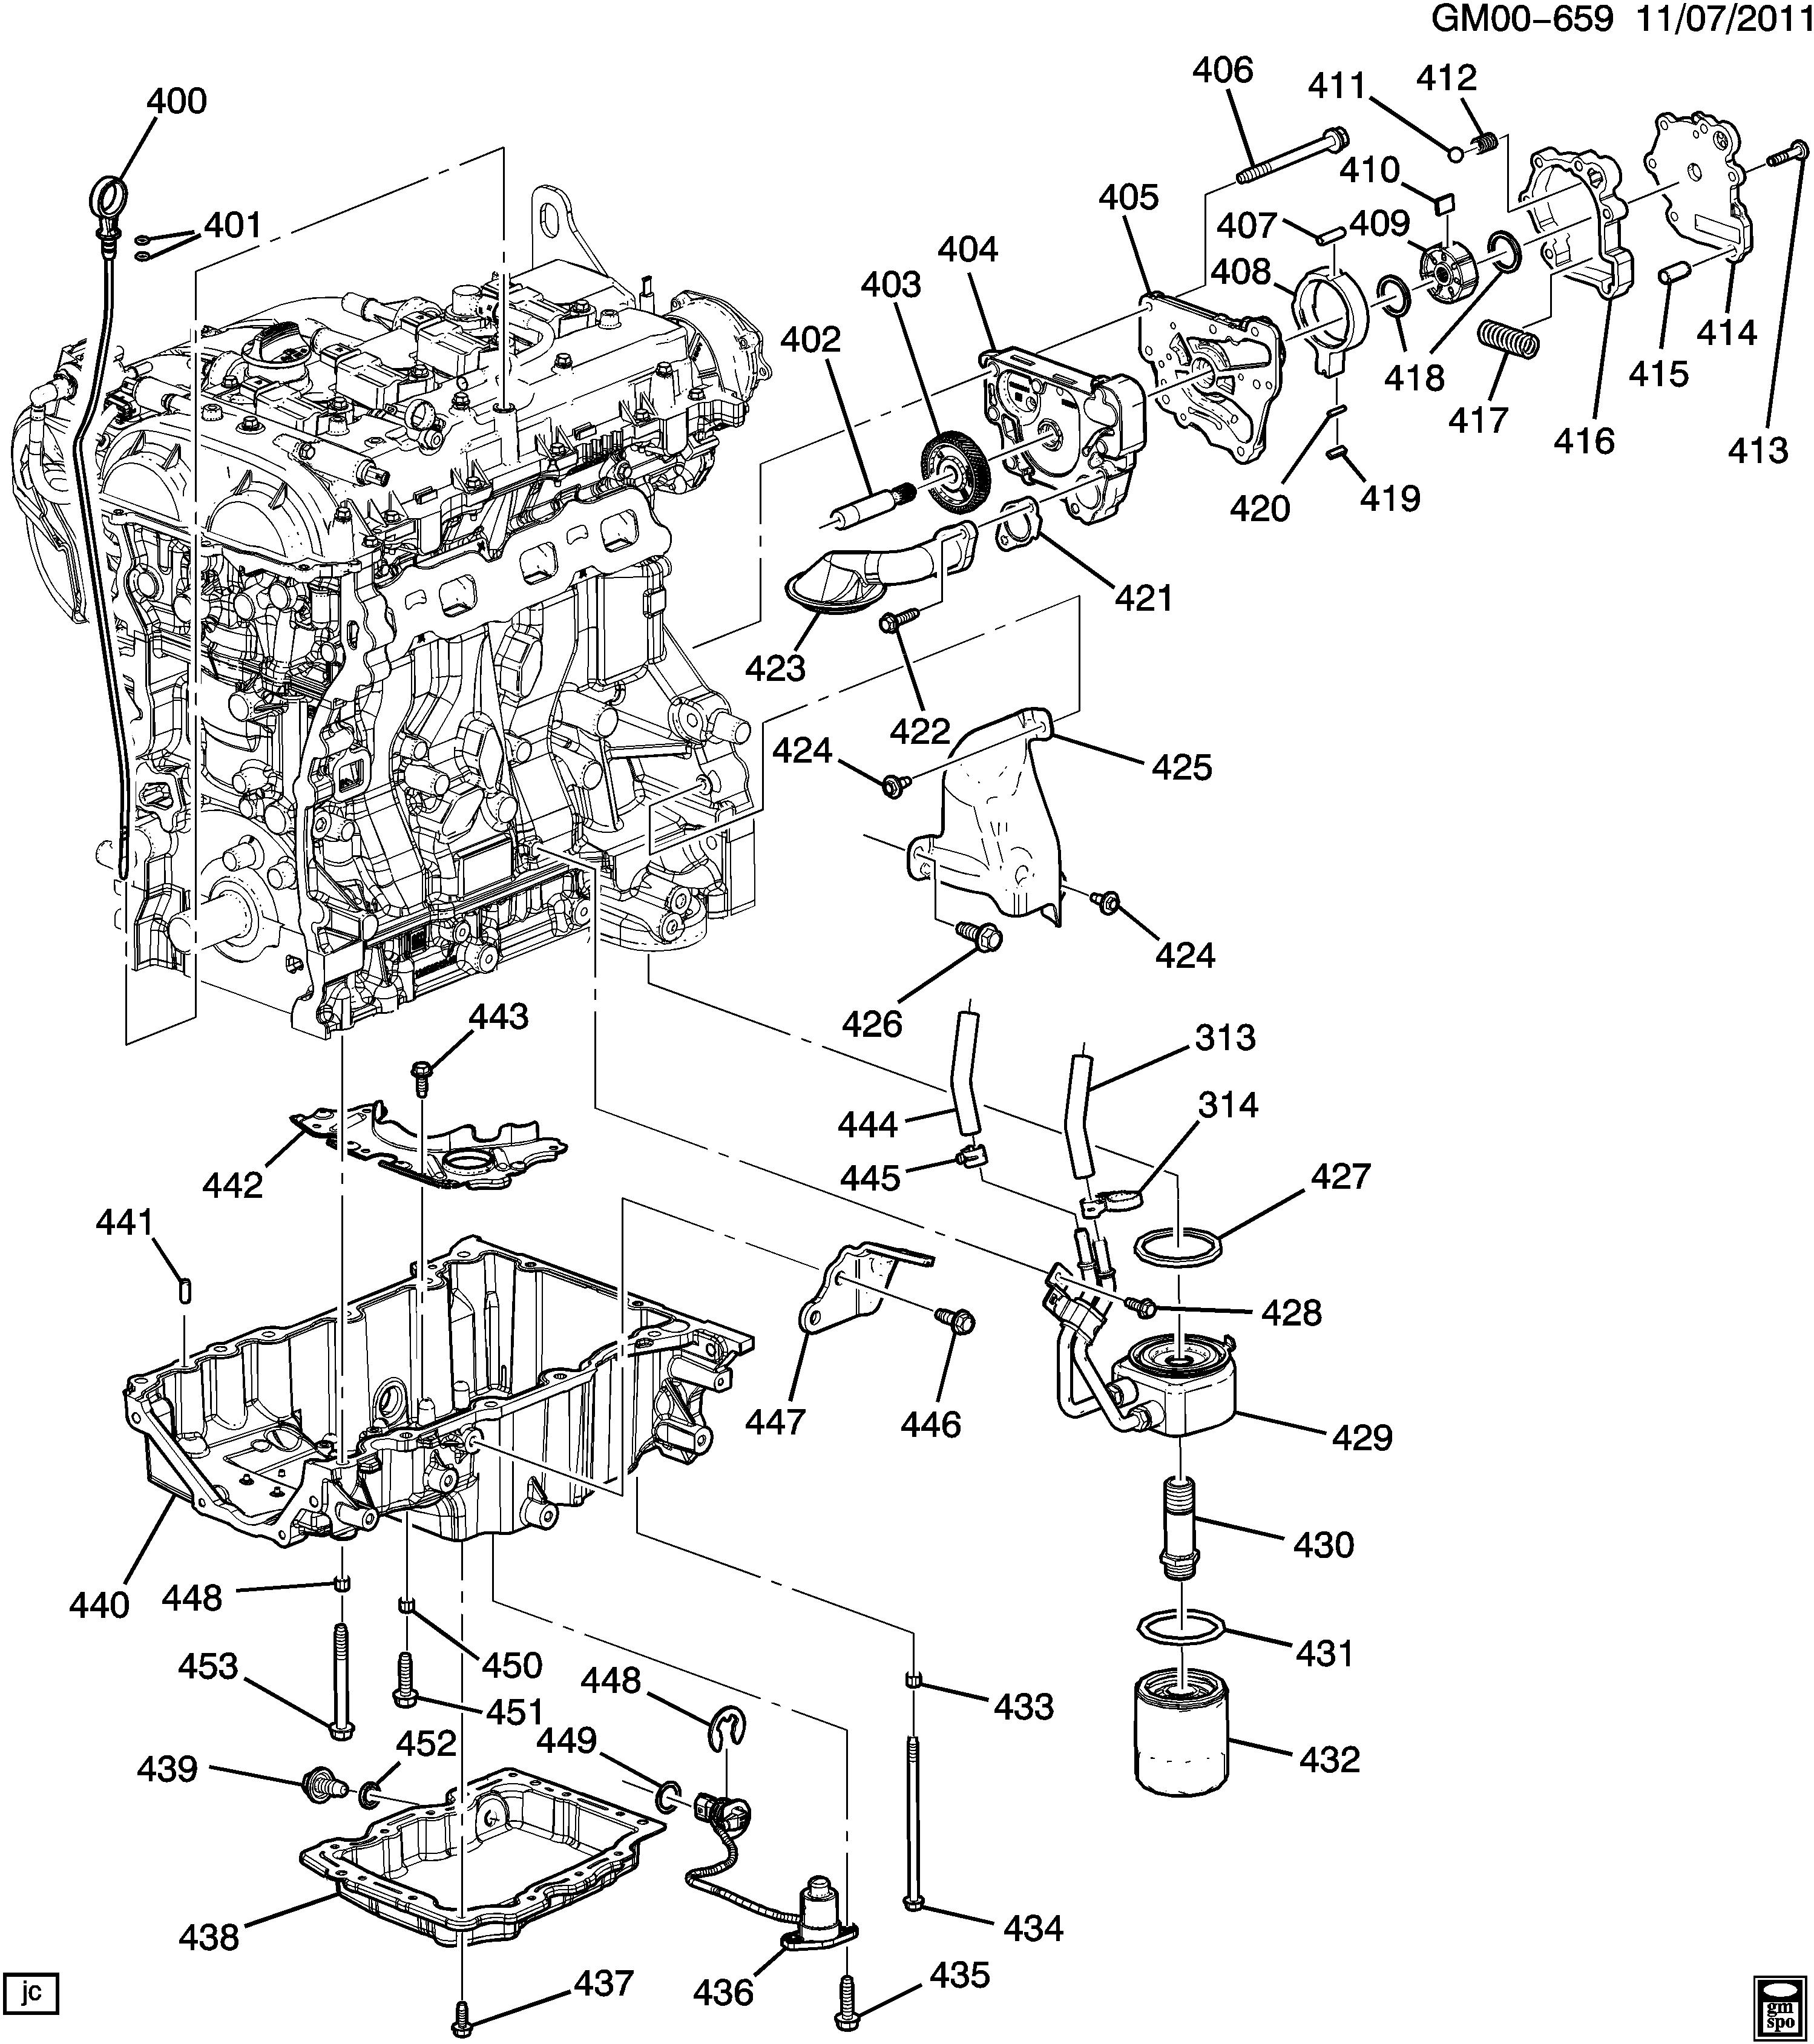 2006 Cadillac Dt Wiring Diagram